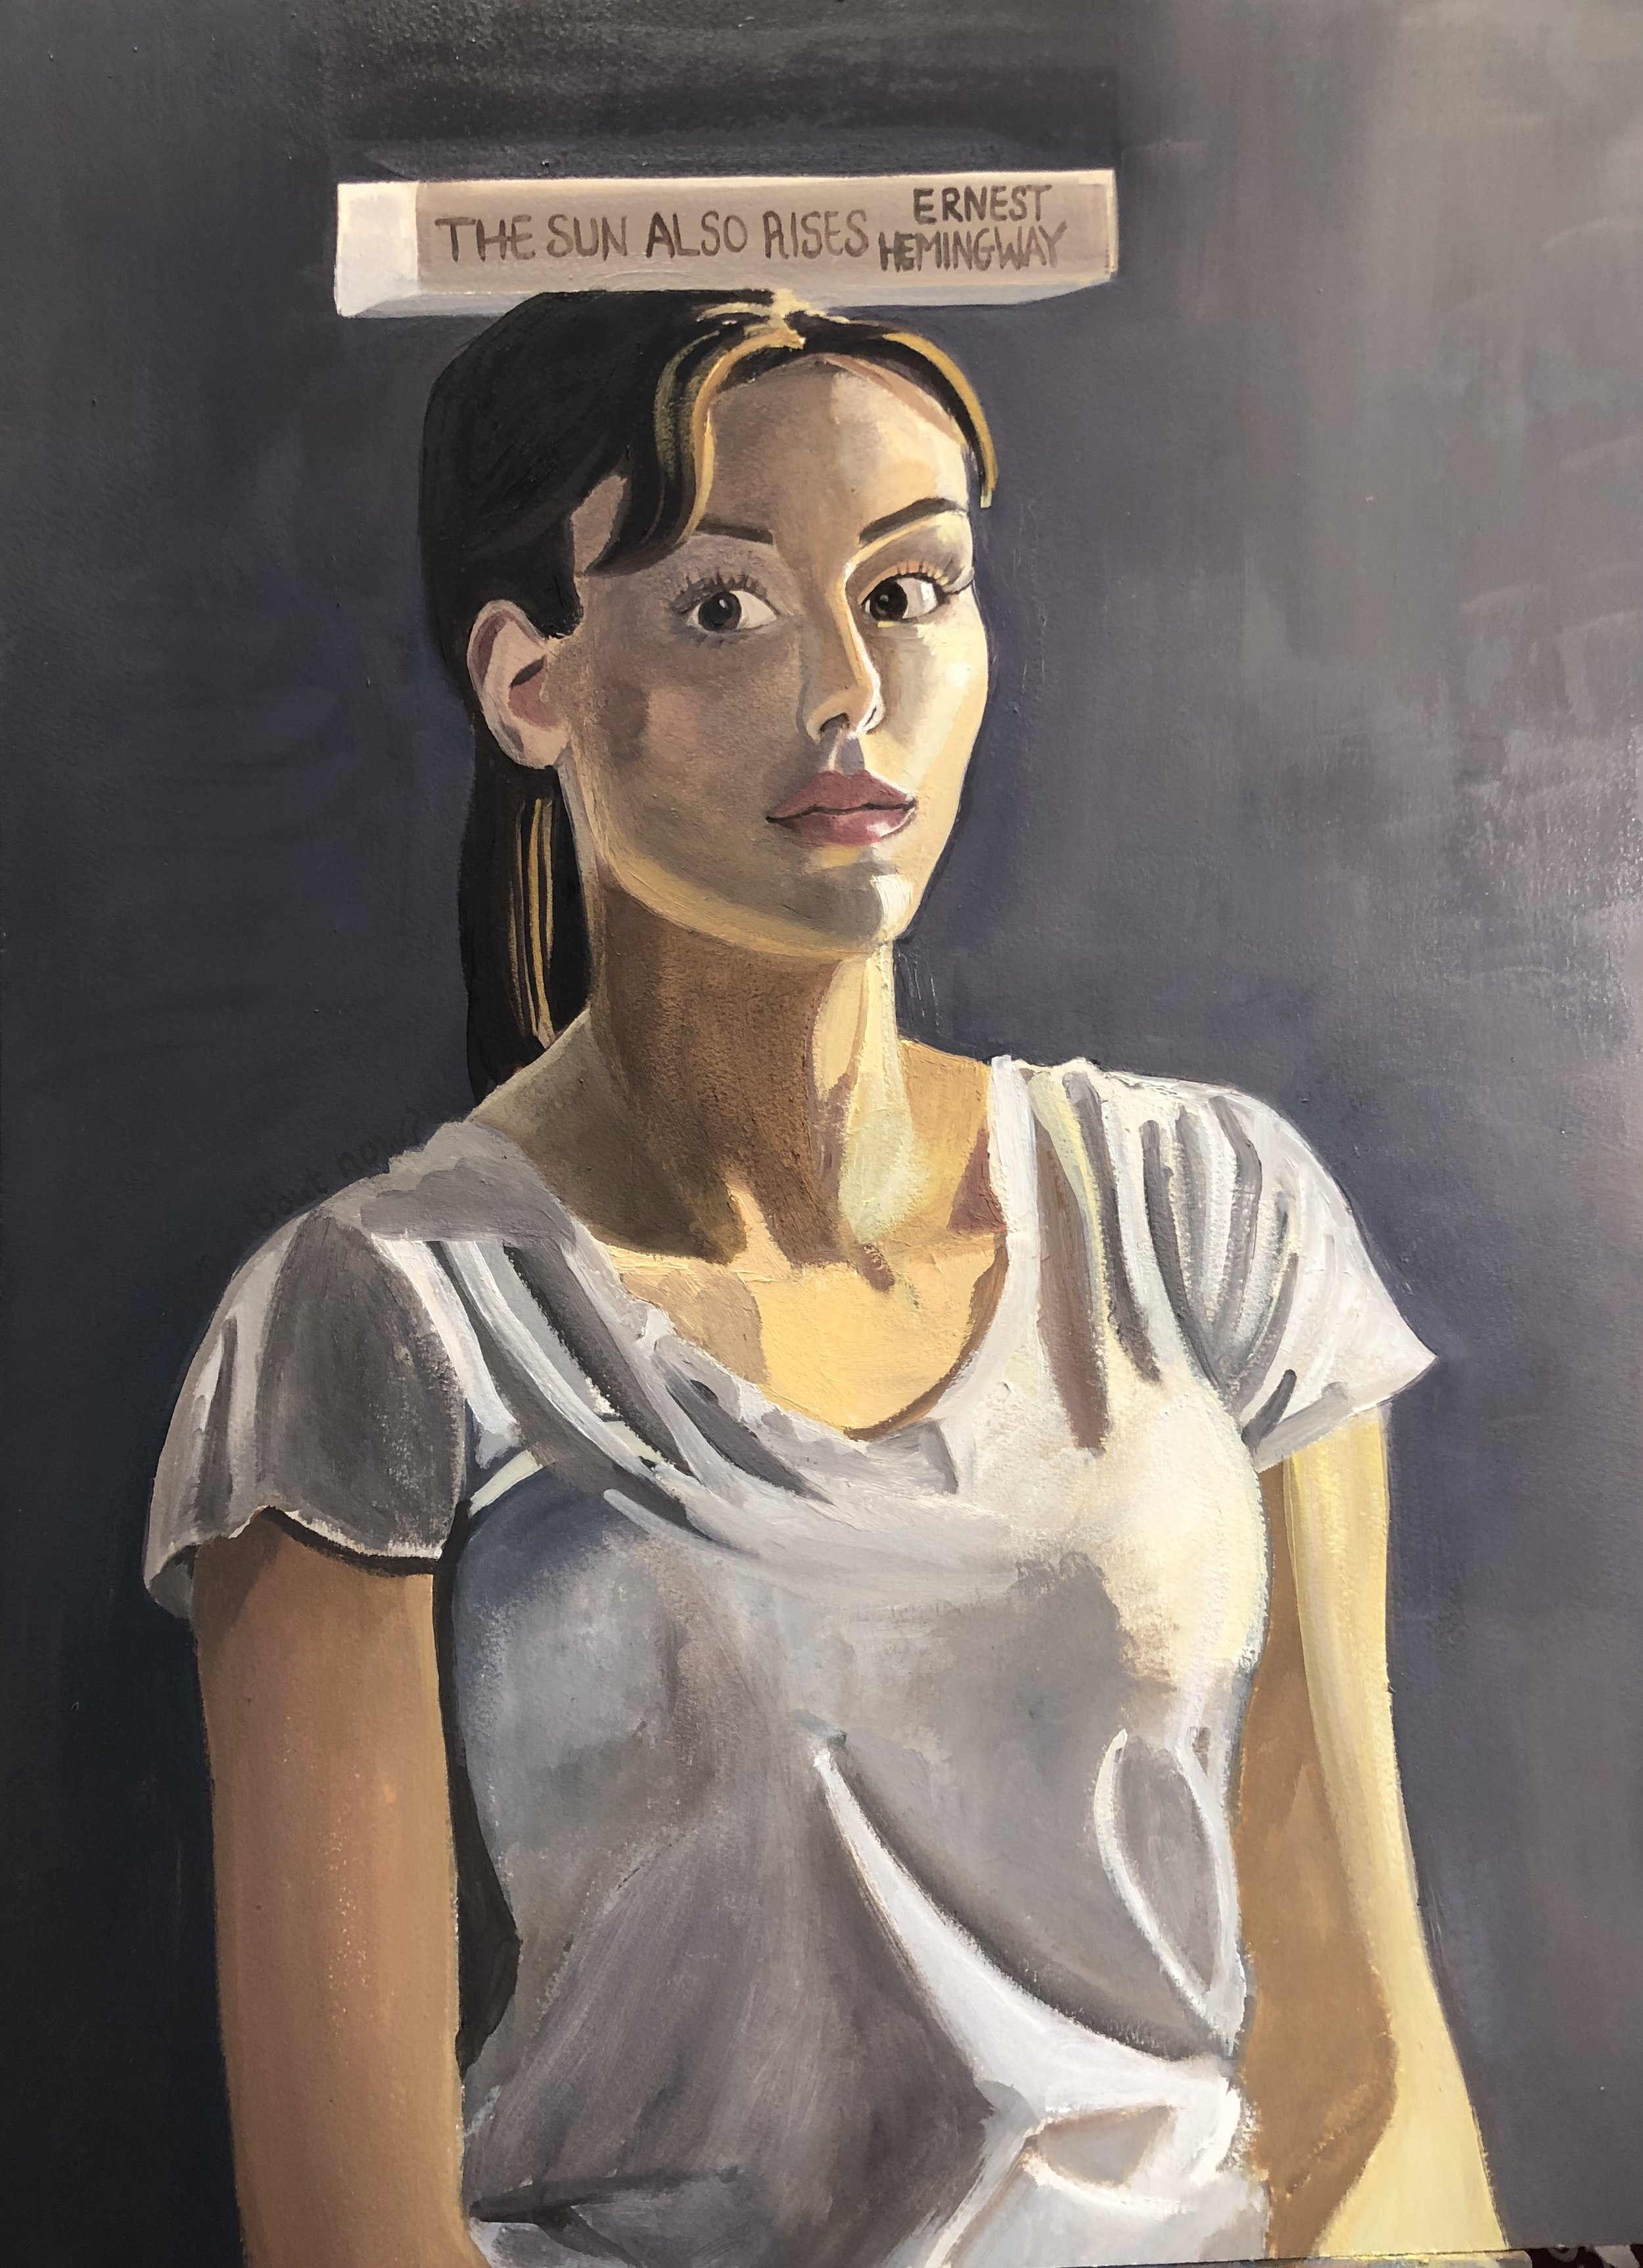 katrina-eugenia-self-portrait-oil-painting-the-sun-also-rises-ernest-hemingway.jpg